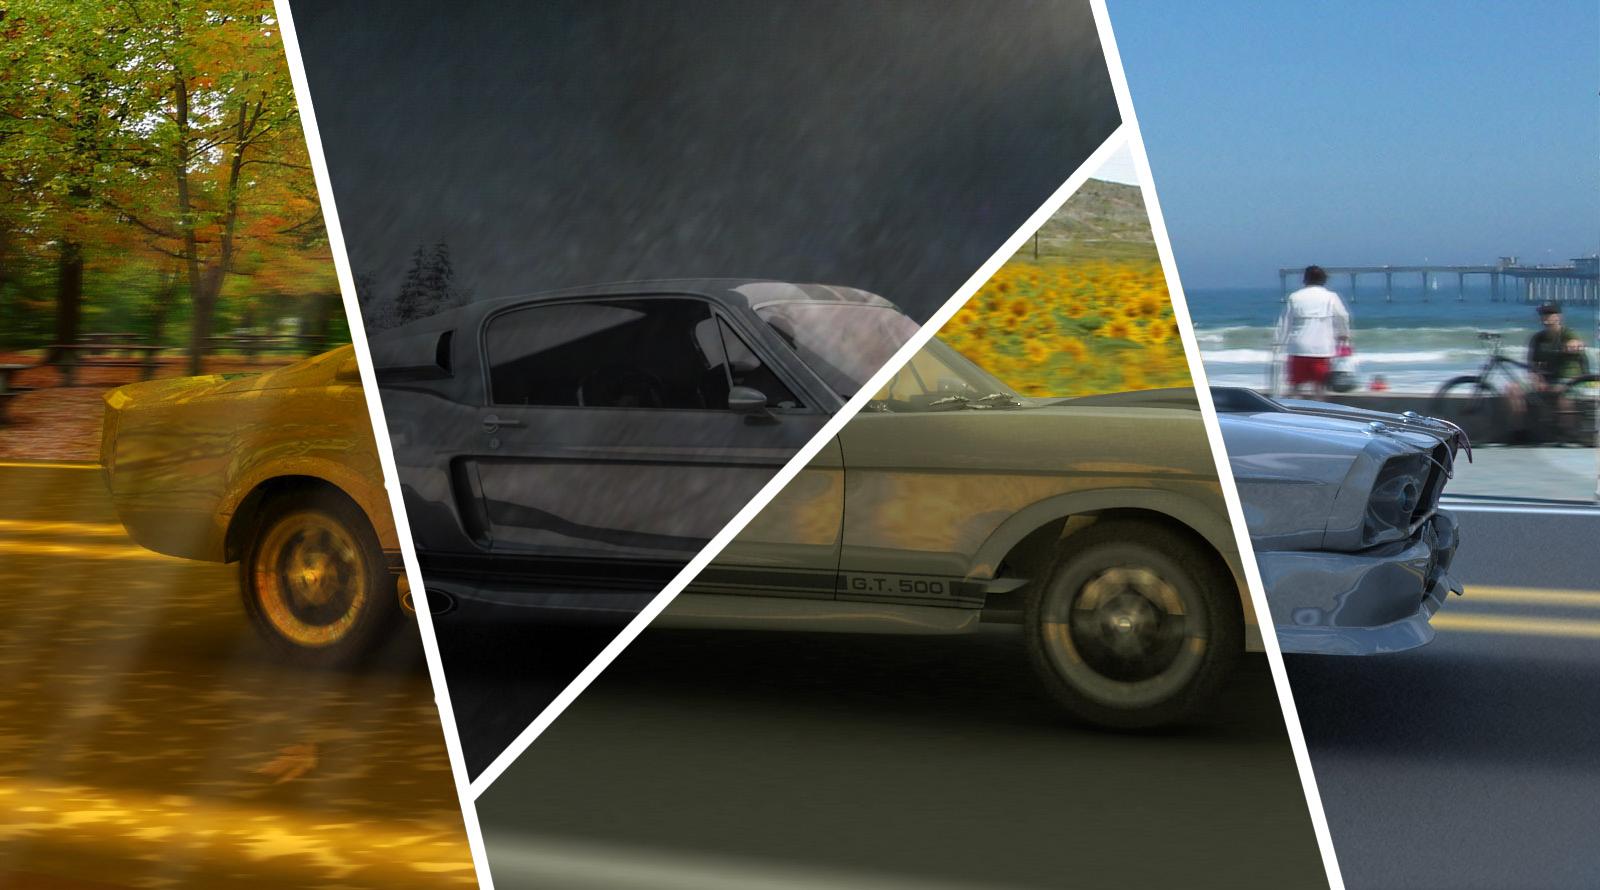 Mustang 4 Seasons Composite by lcamaral